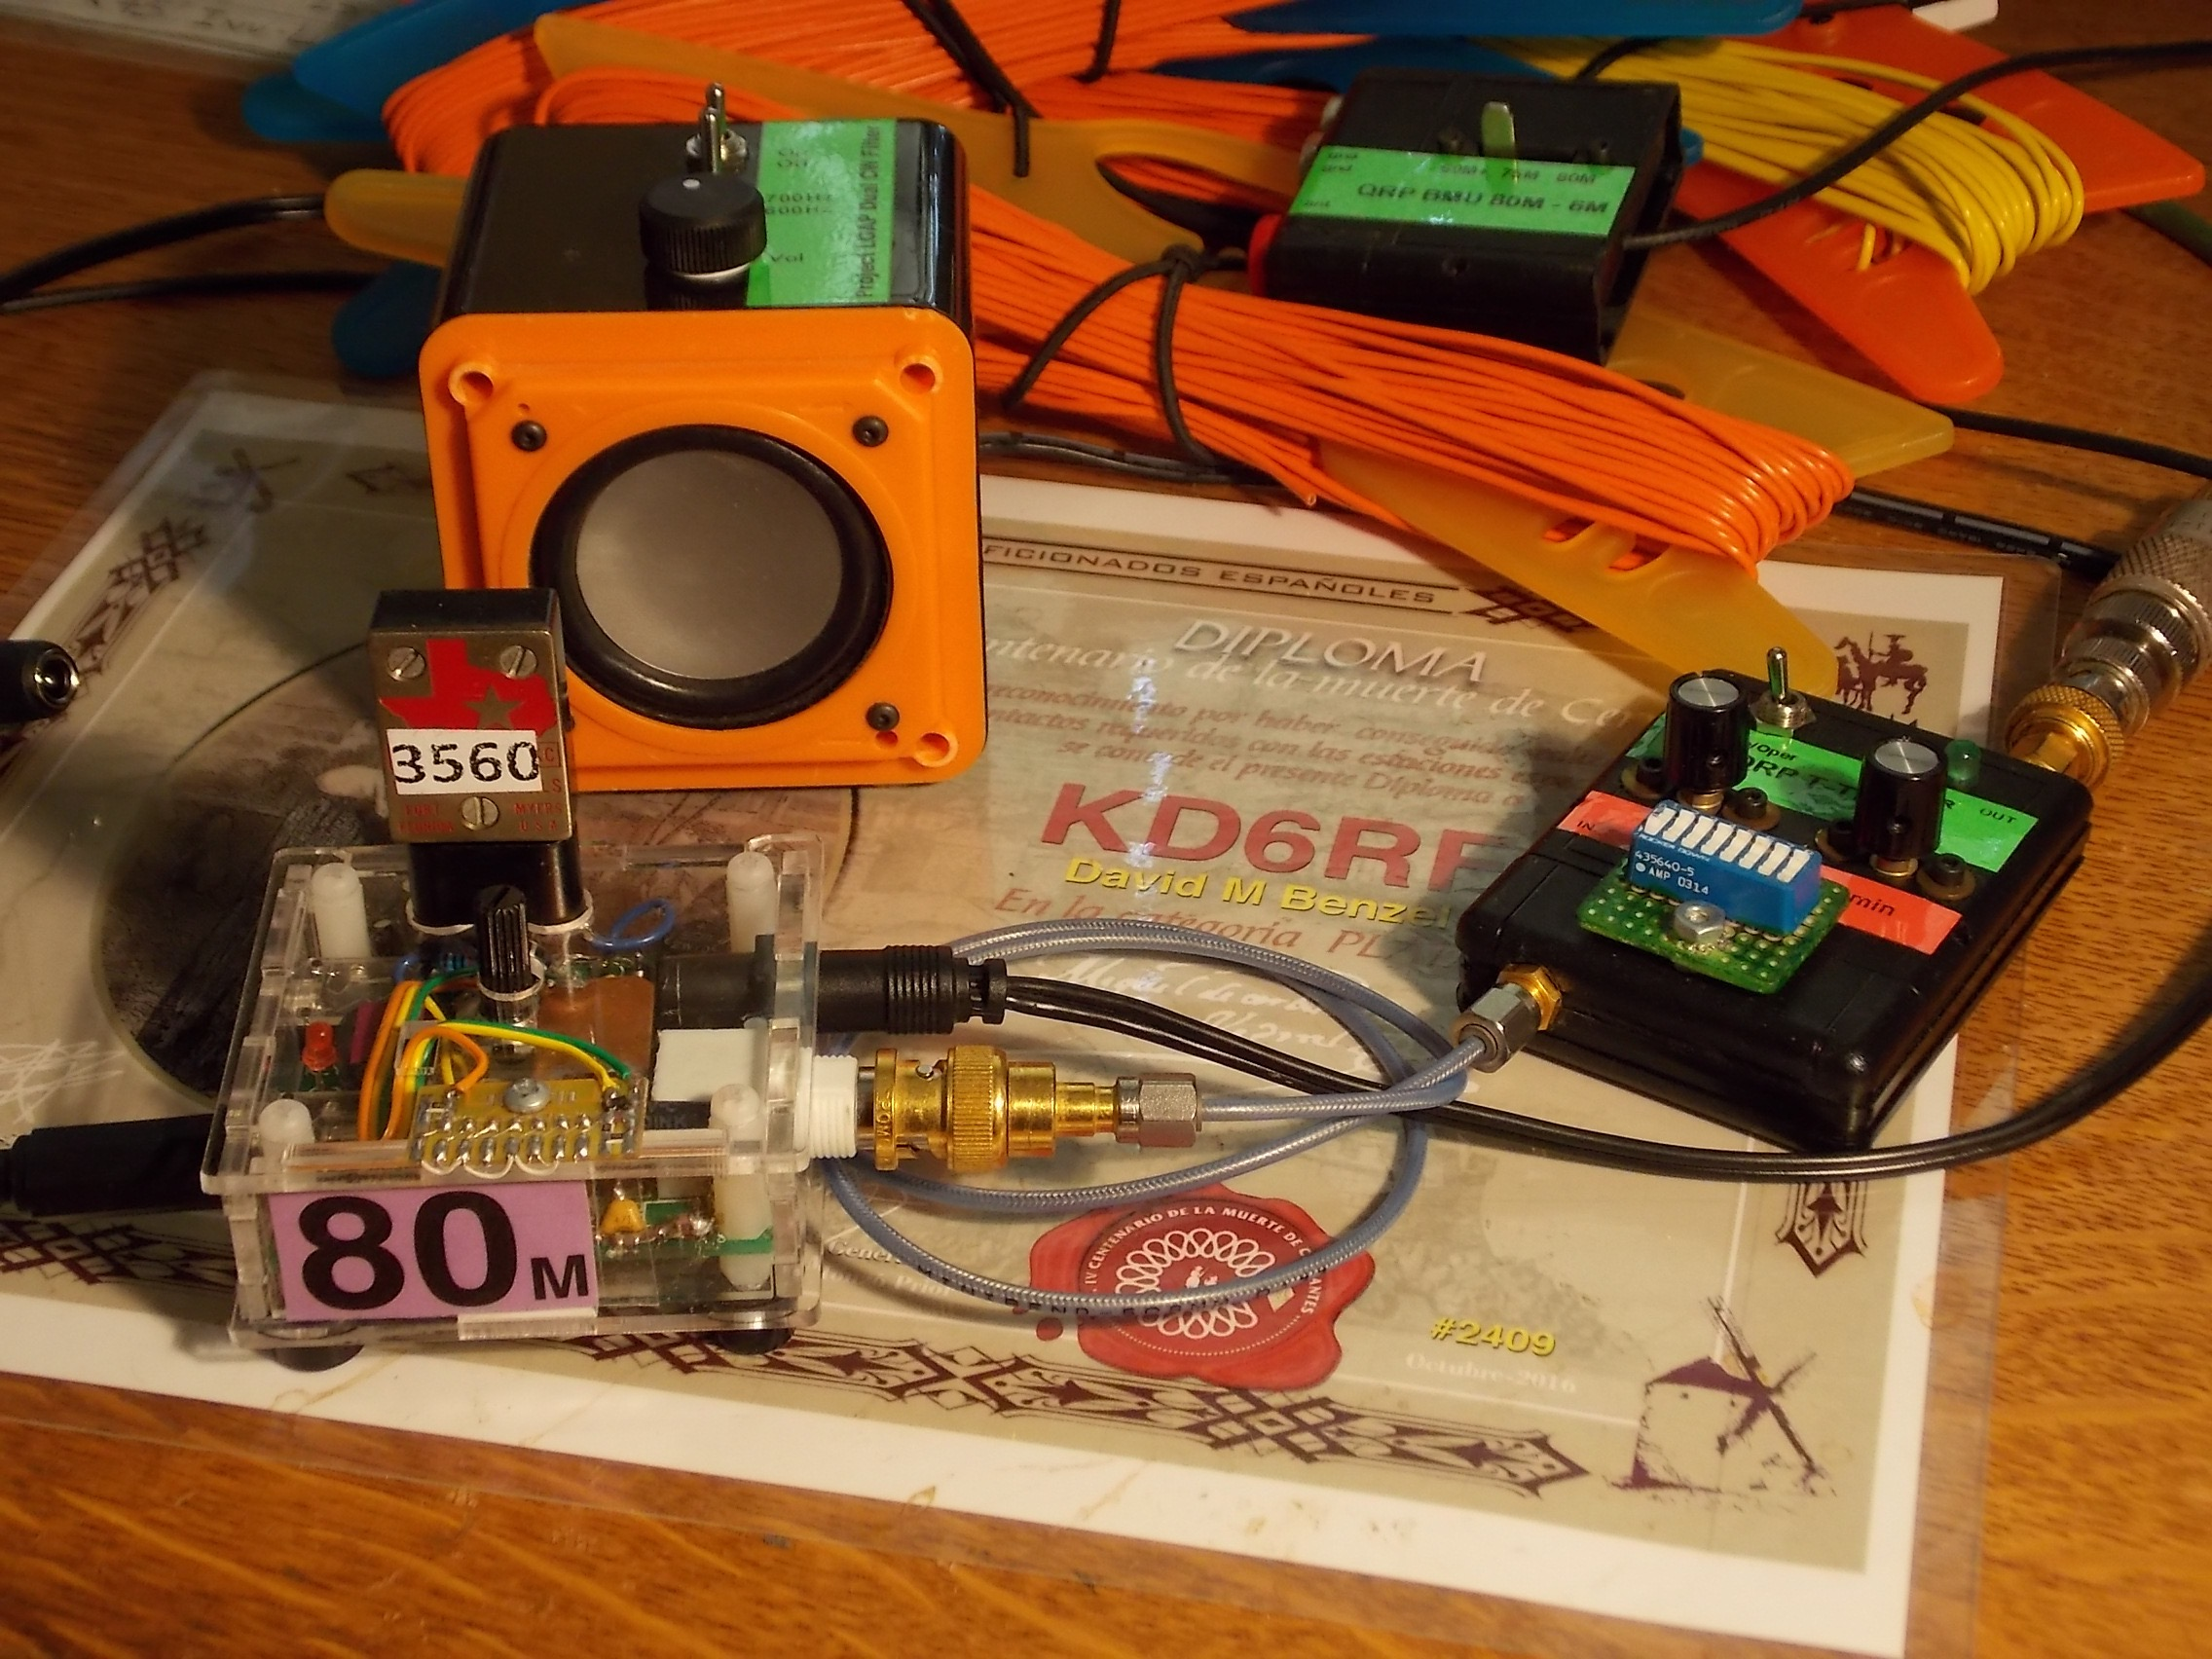 80M LOAP2 Pixie n CW Filter Spkr n T-Tuner n BMU